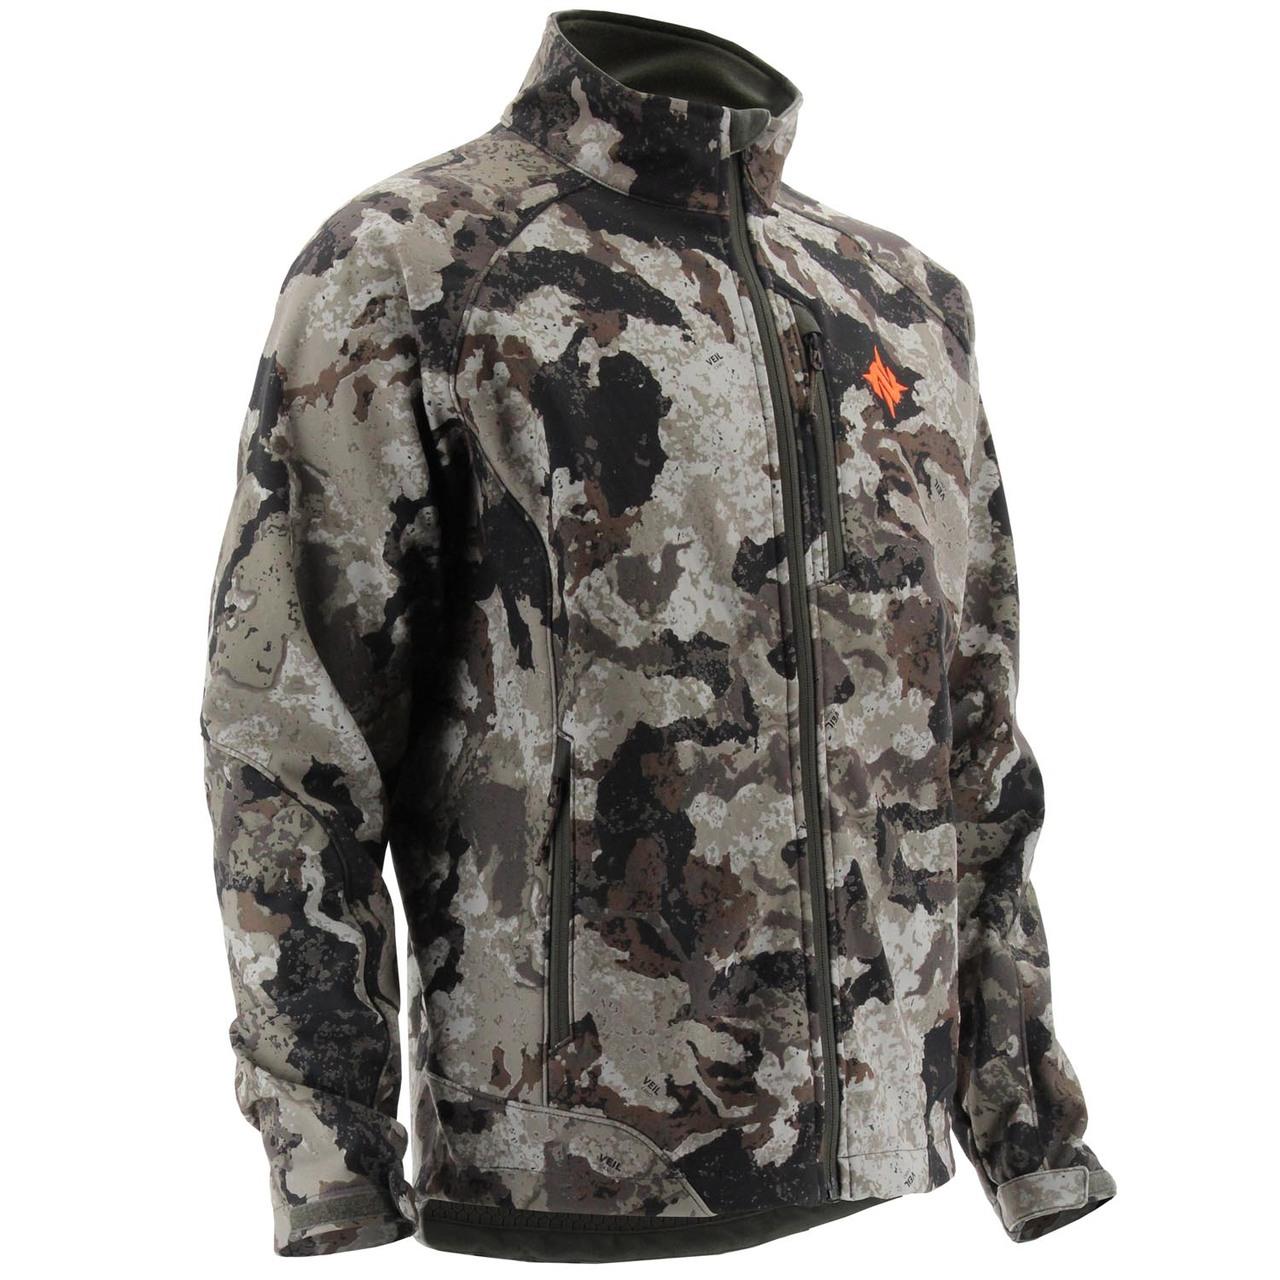 45ecd4a8f60c0 Nomad Outdoors Barrier Jacket | Camo Jacket | Hunting Coat